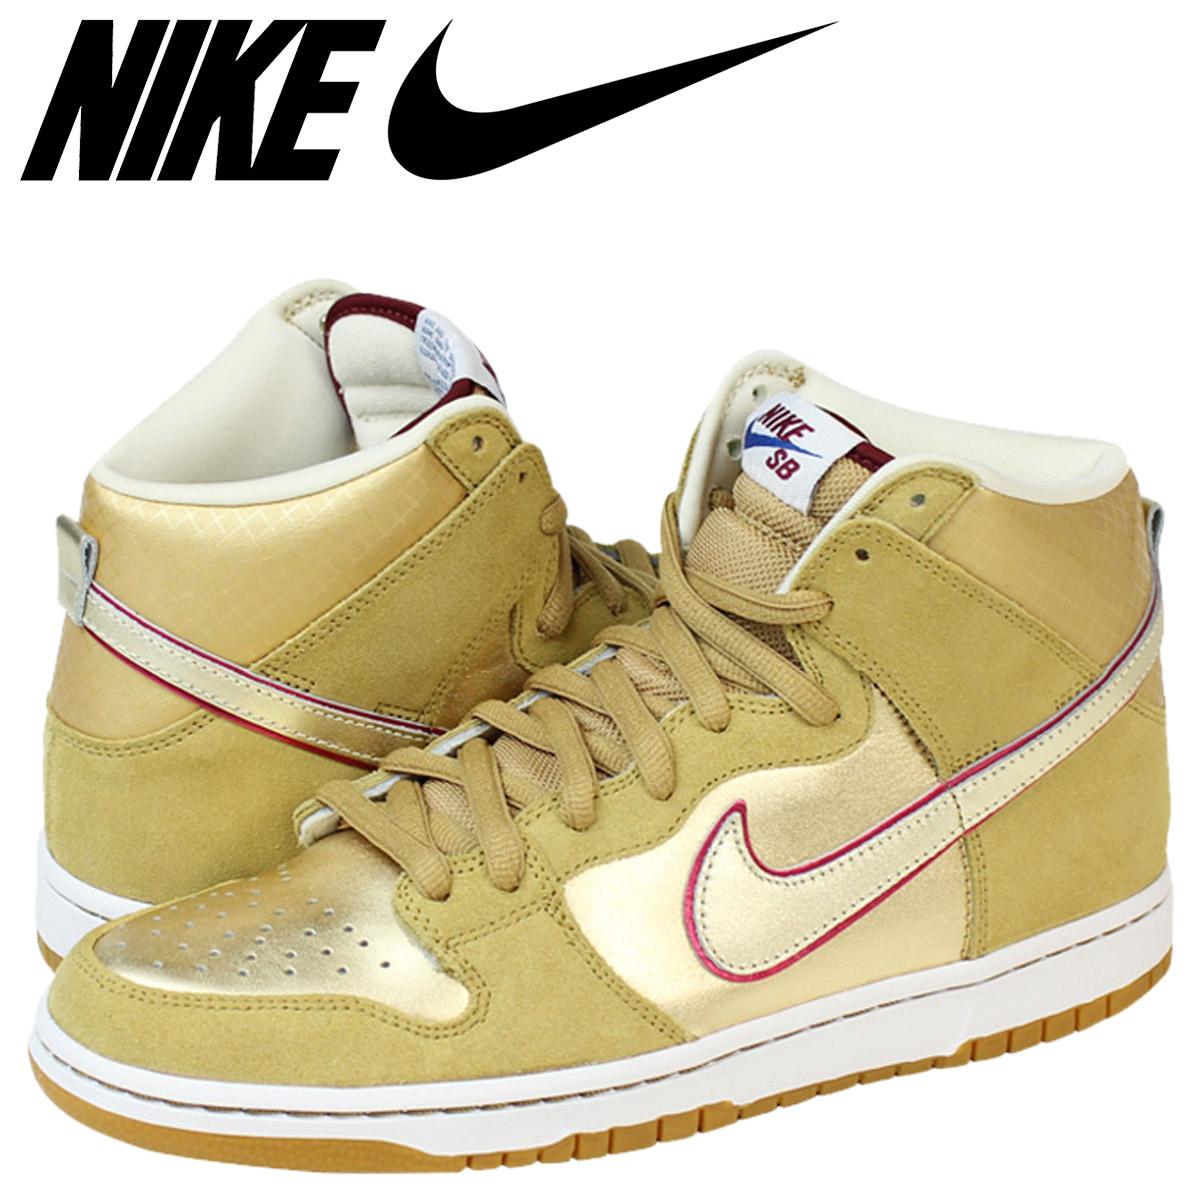 new product f1eaf 972b8 Nike NIKE dunk sneakers DUNK HI SB KOSTON Dunk high SB Coston 313171-702  gold mens